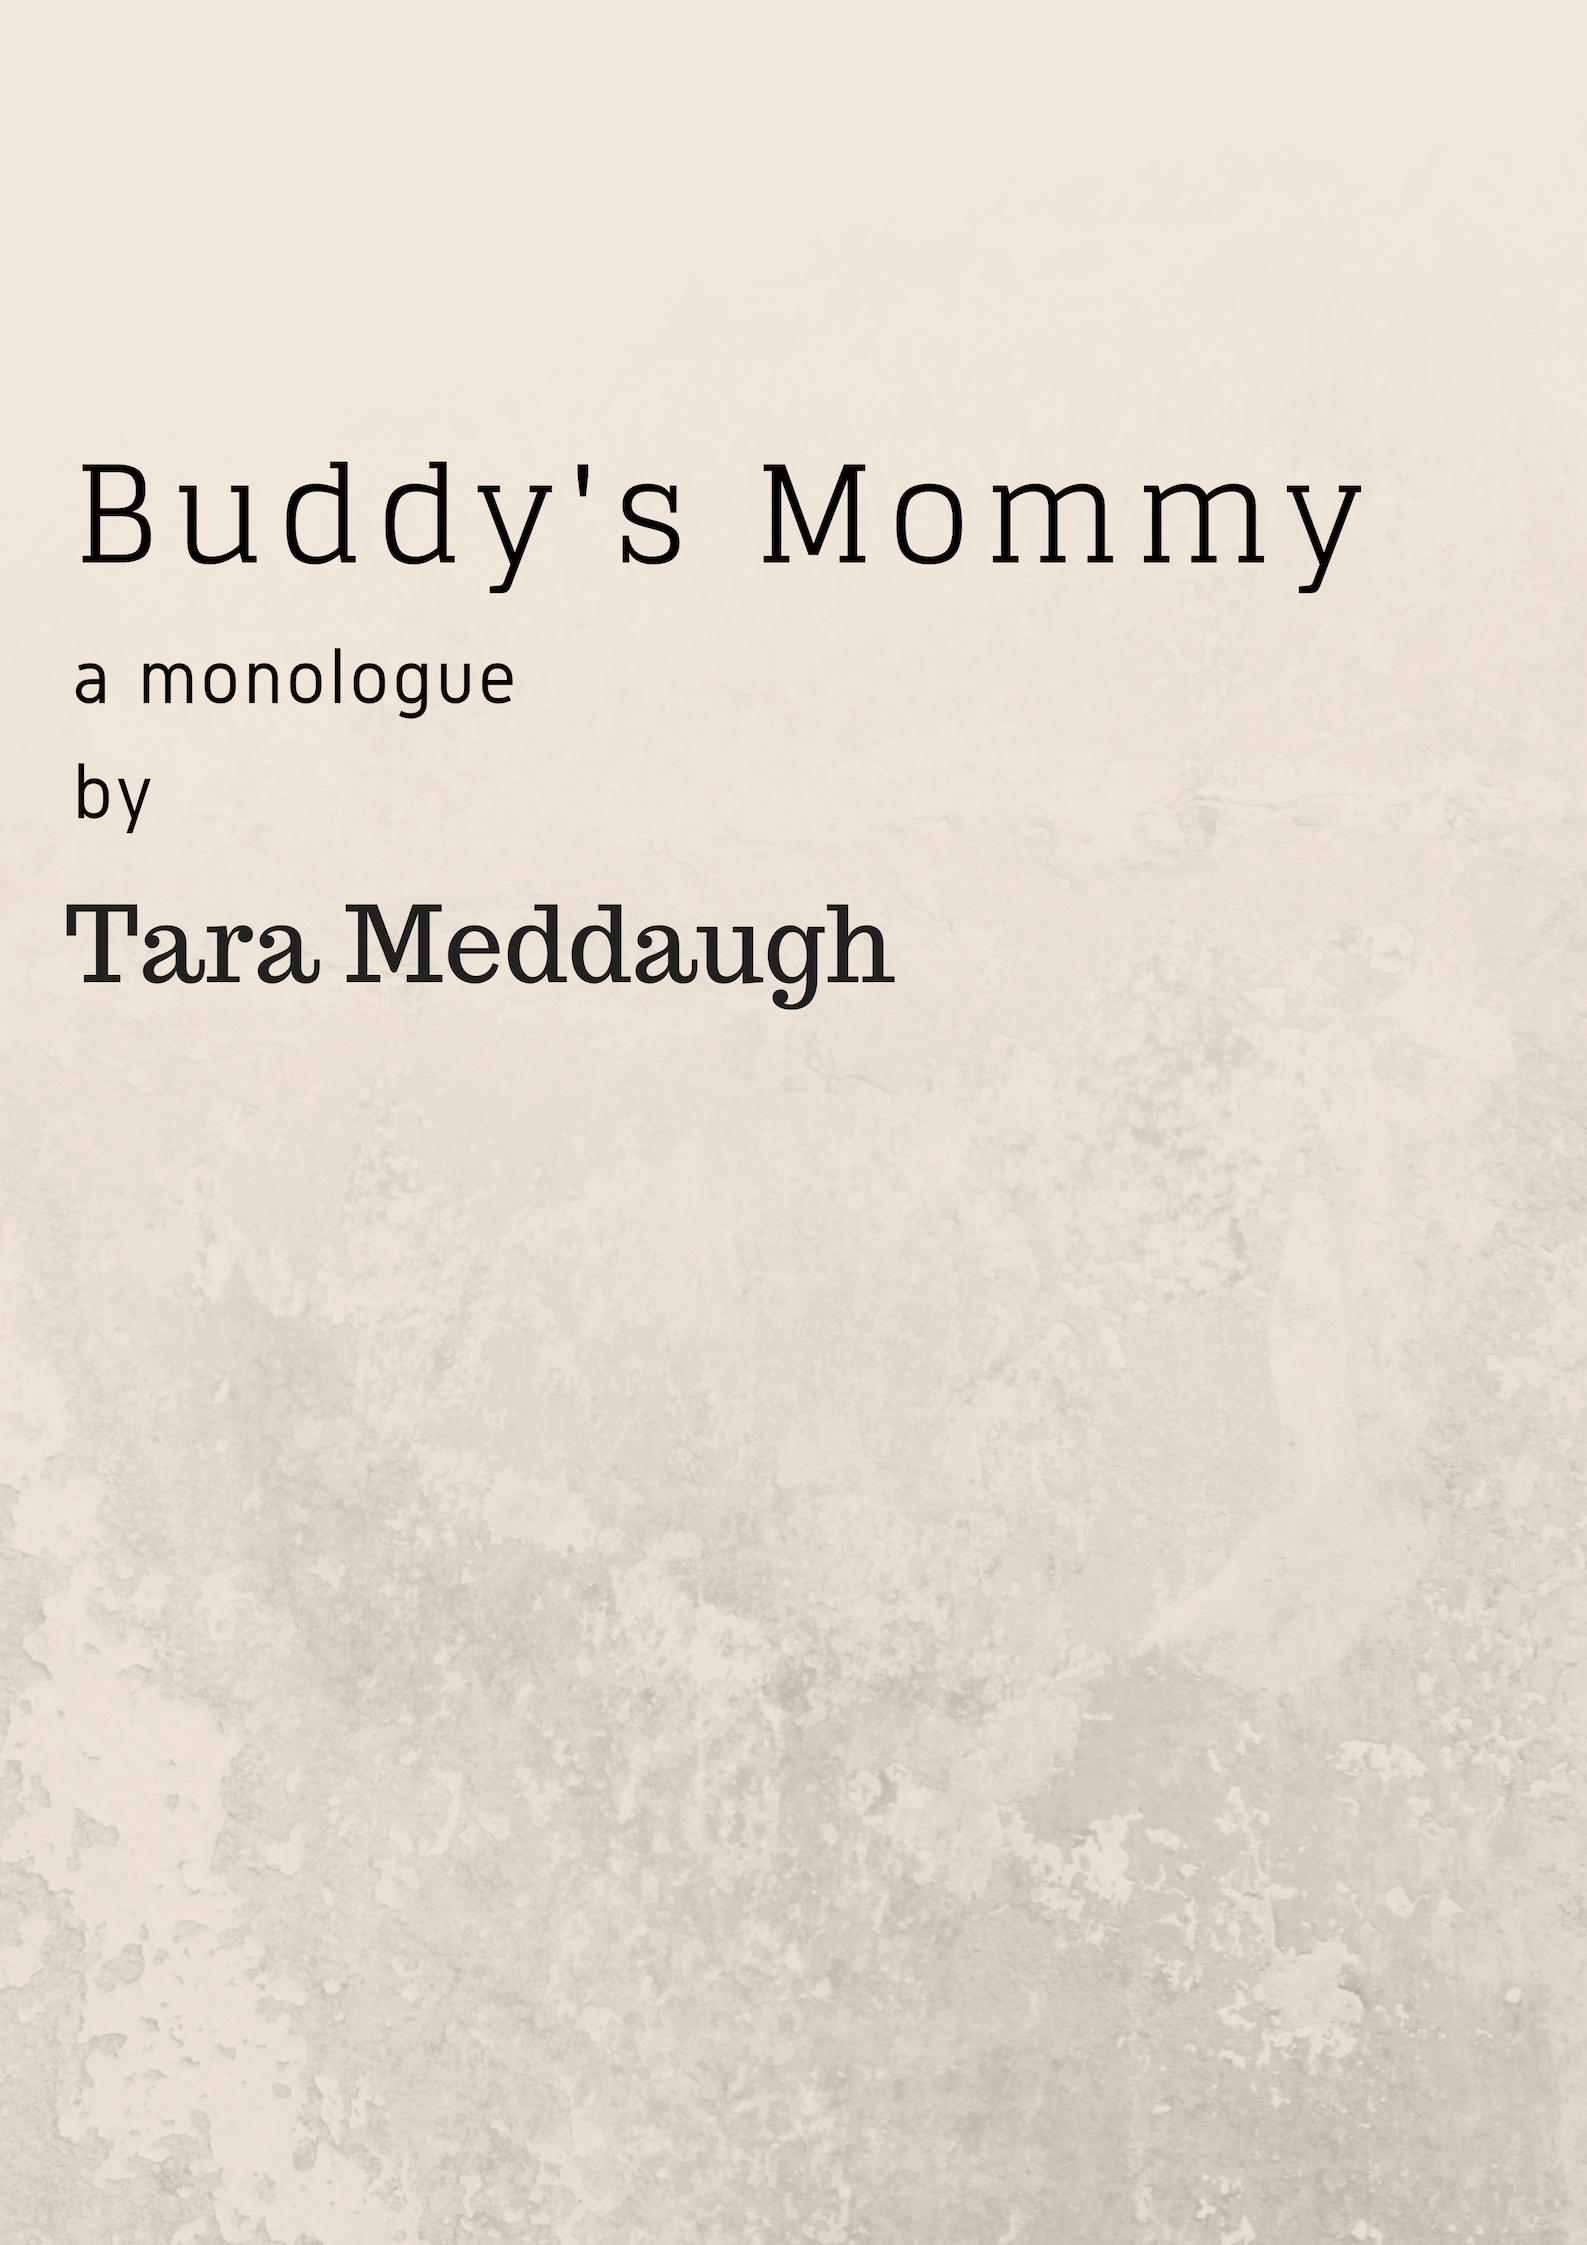 Buddy's Mommy.jpg